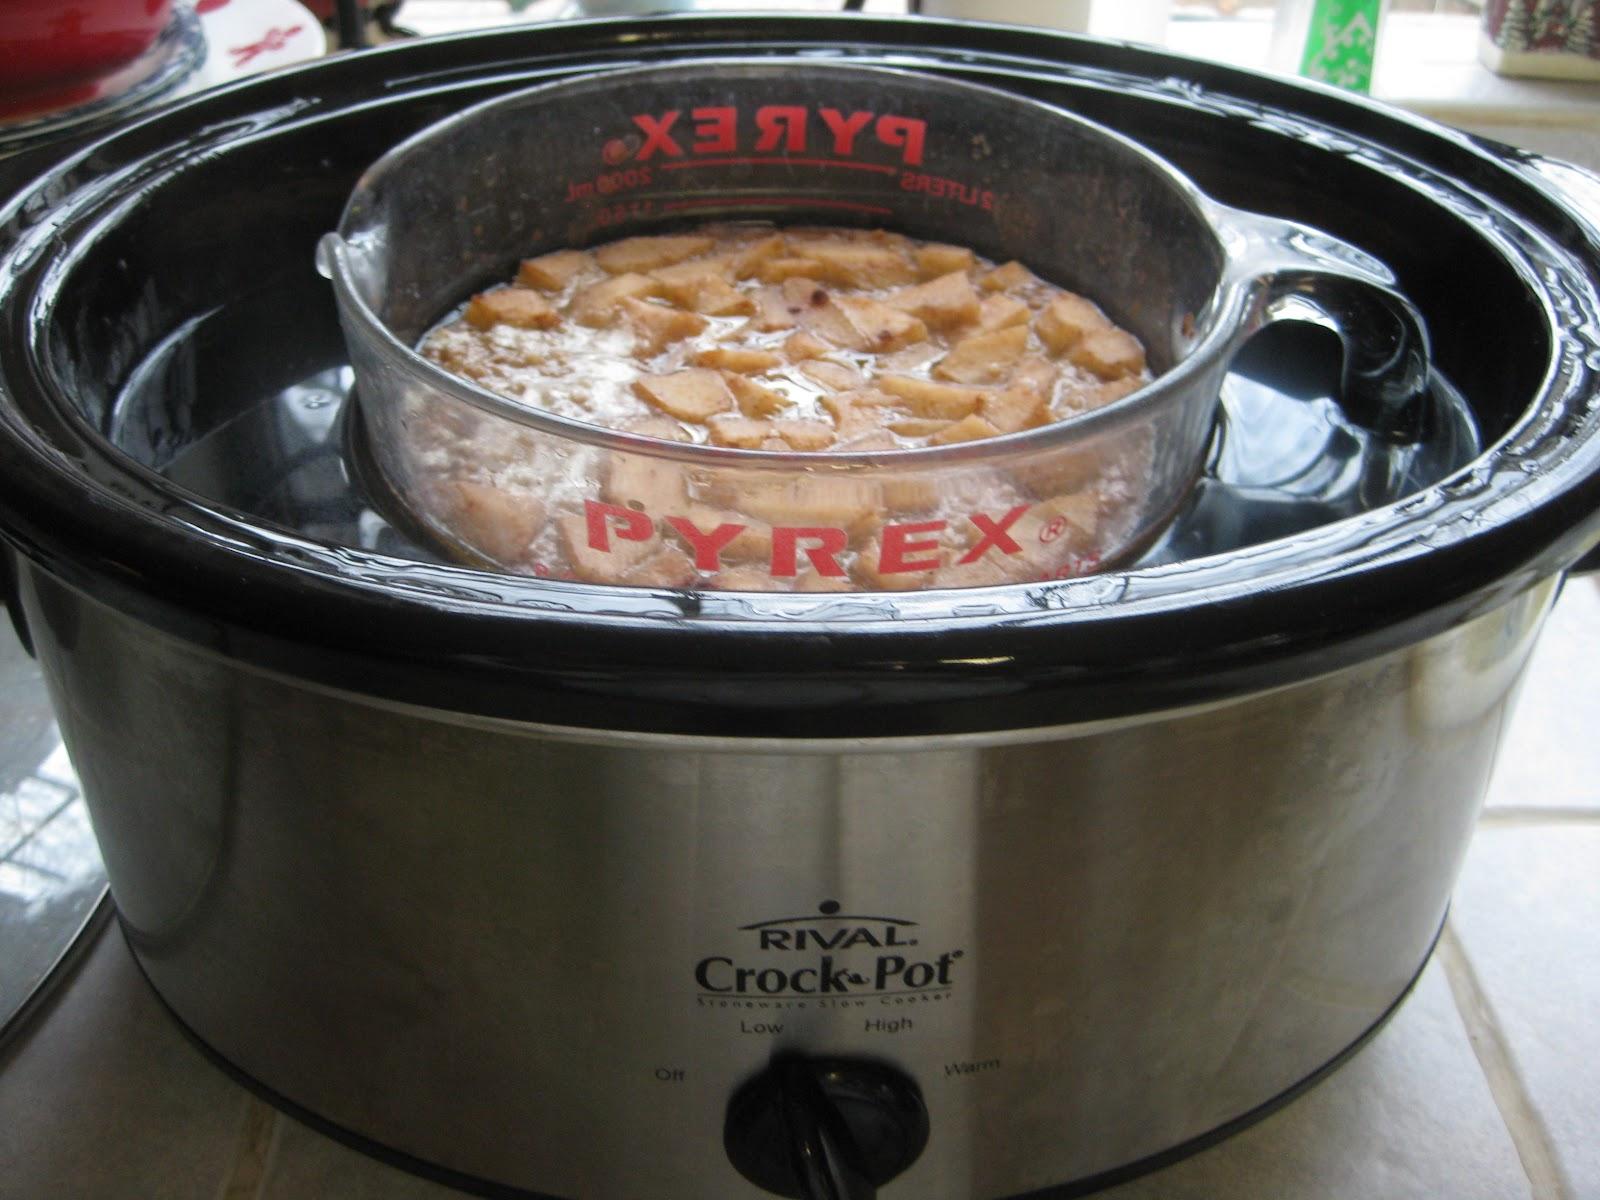 Heidi's Recipes: Crock Pot Oatmeal Recipe